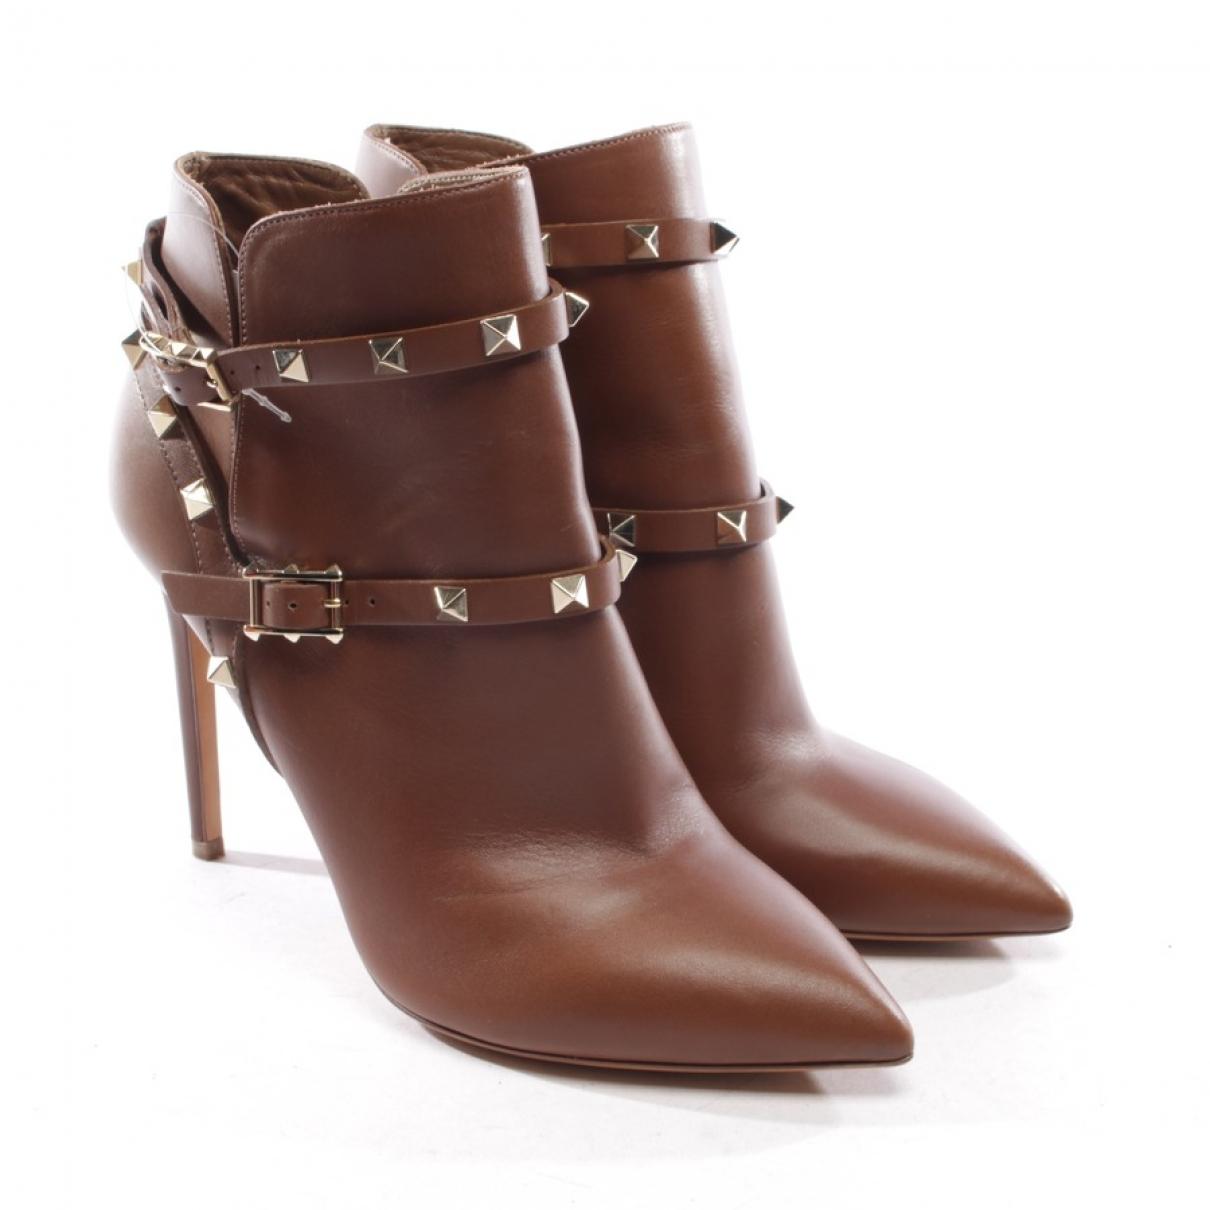 Valentino Garavani Rockstud Brown Leather Ankle boots for Women 40.5 EU